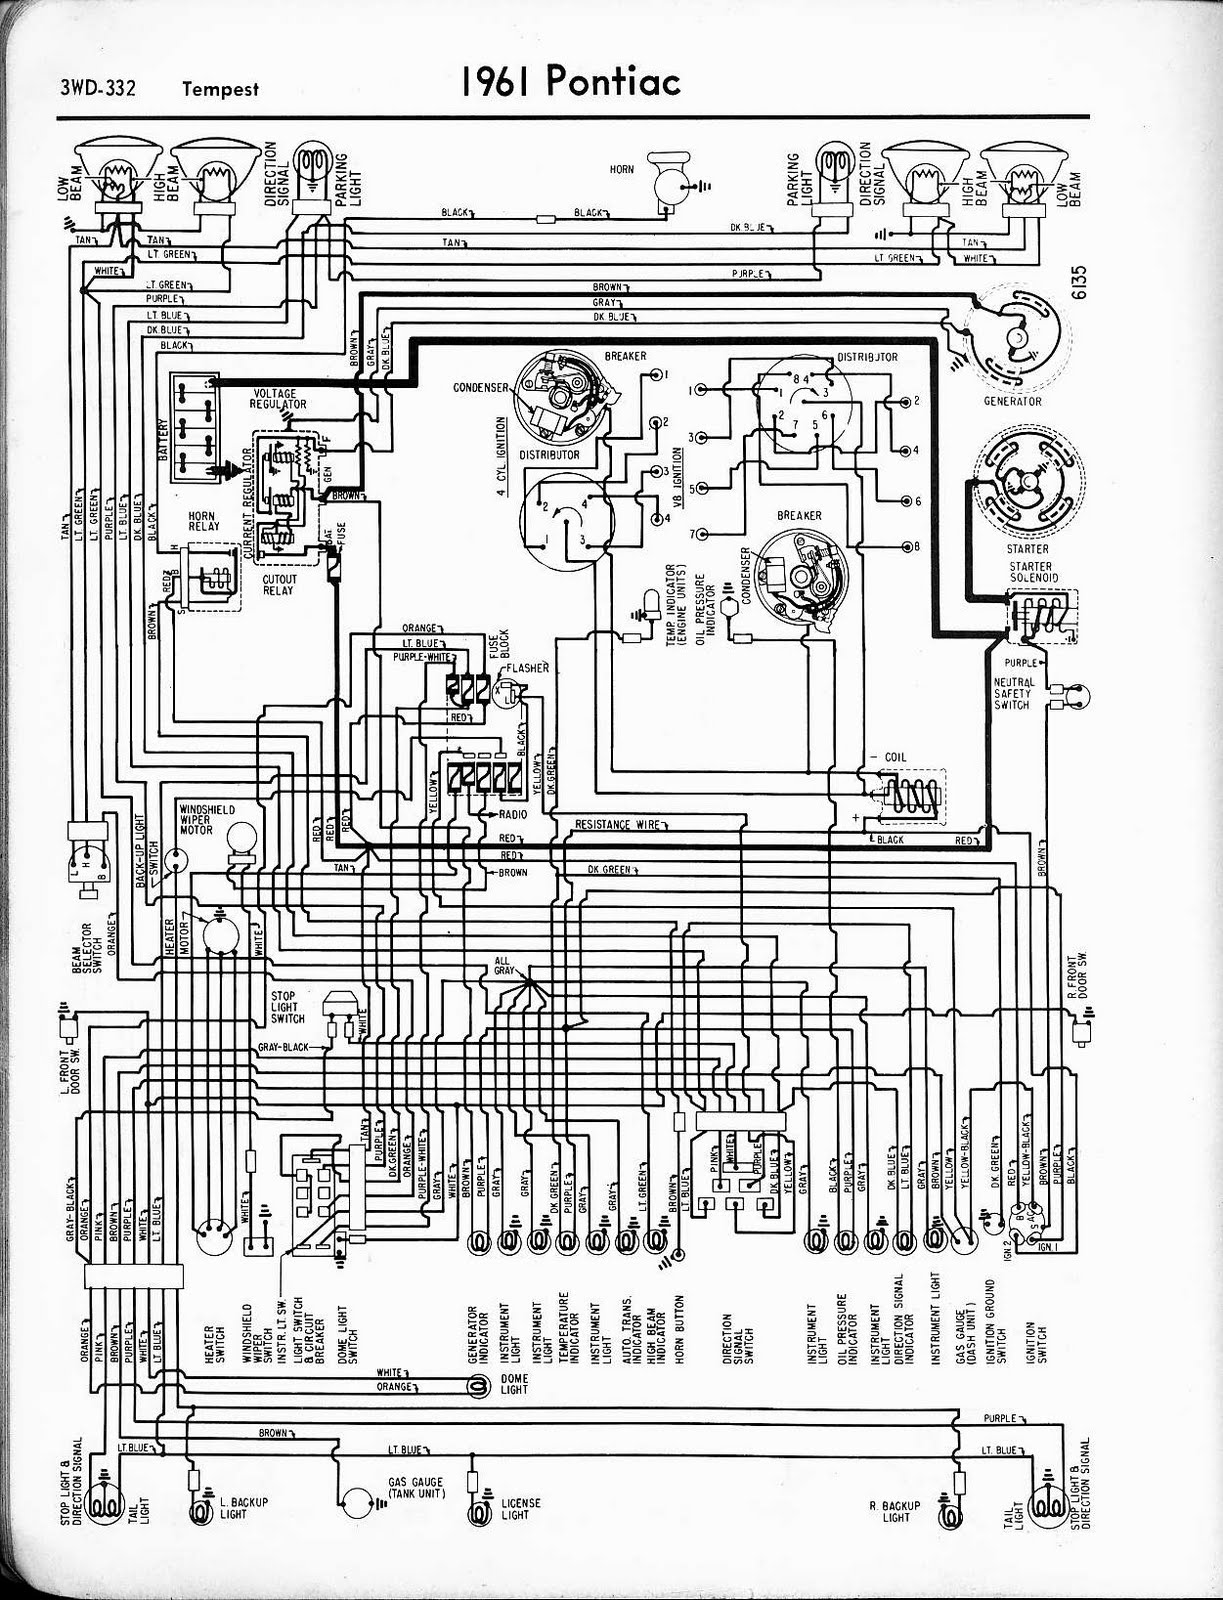 small resolution of free auto wiring diagram 1961 pontiac tempest wiring diagram 2003 silverado fog light wiring harness 2009